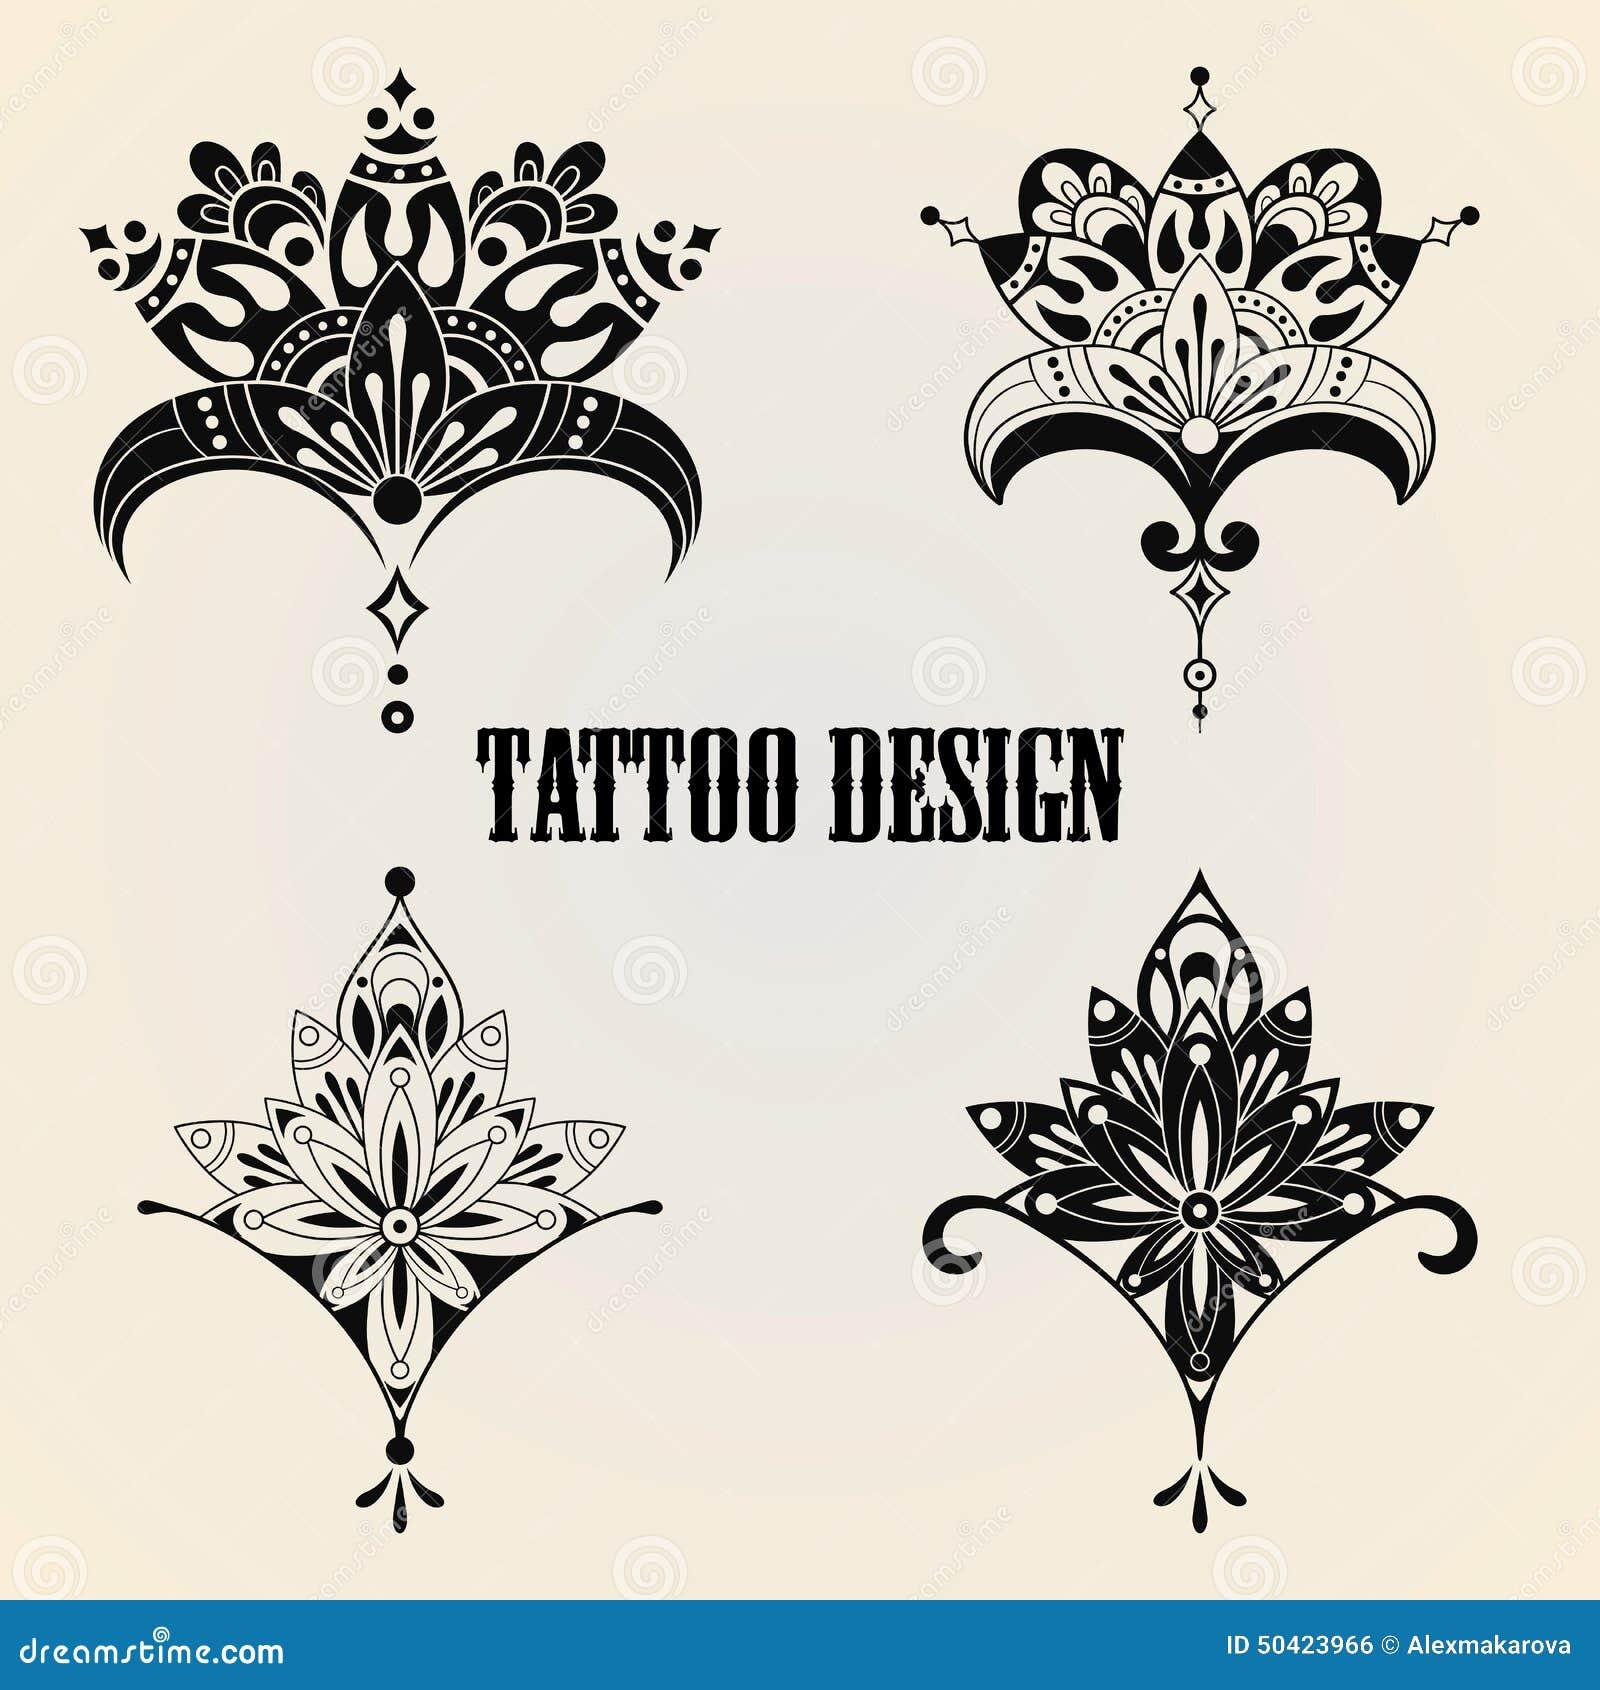 tattoo design elements stock vector image 50423966. Black Bedroom Furniture Sets. Home Design Ideas